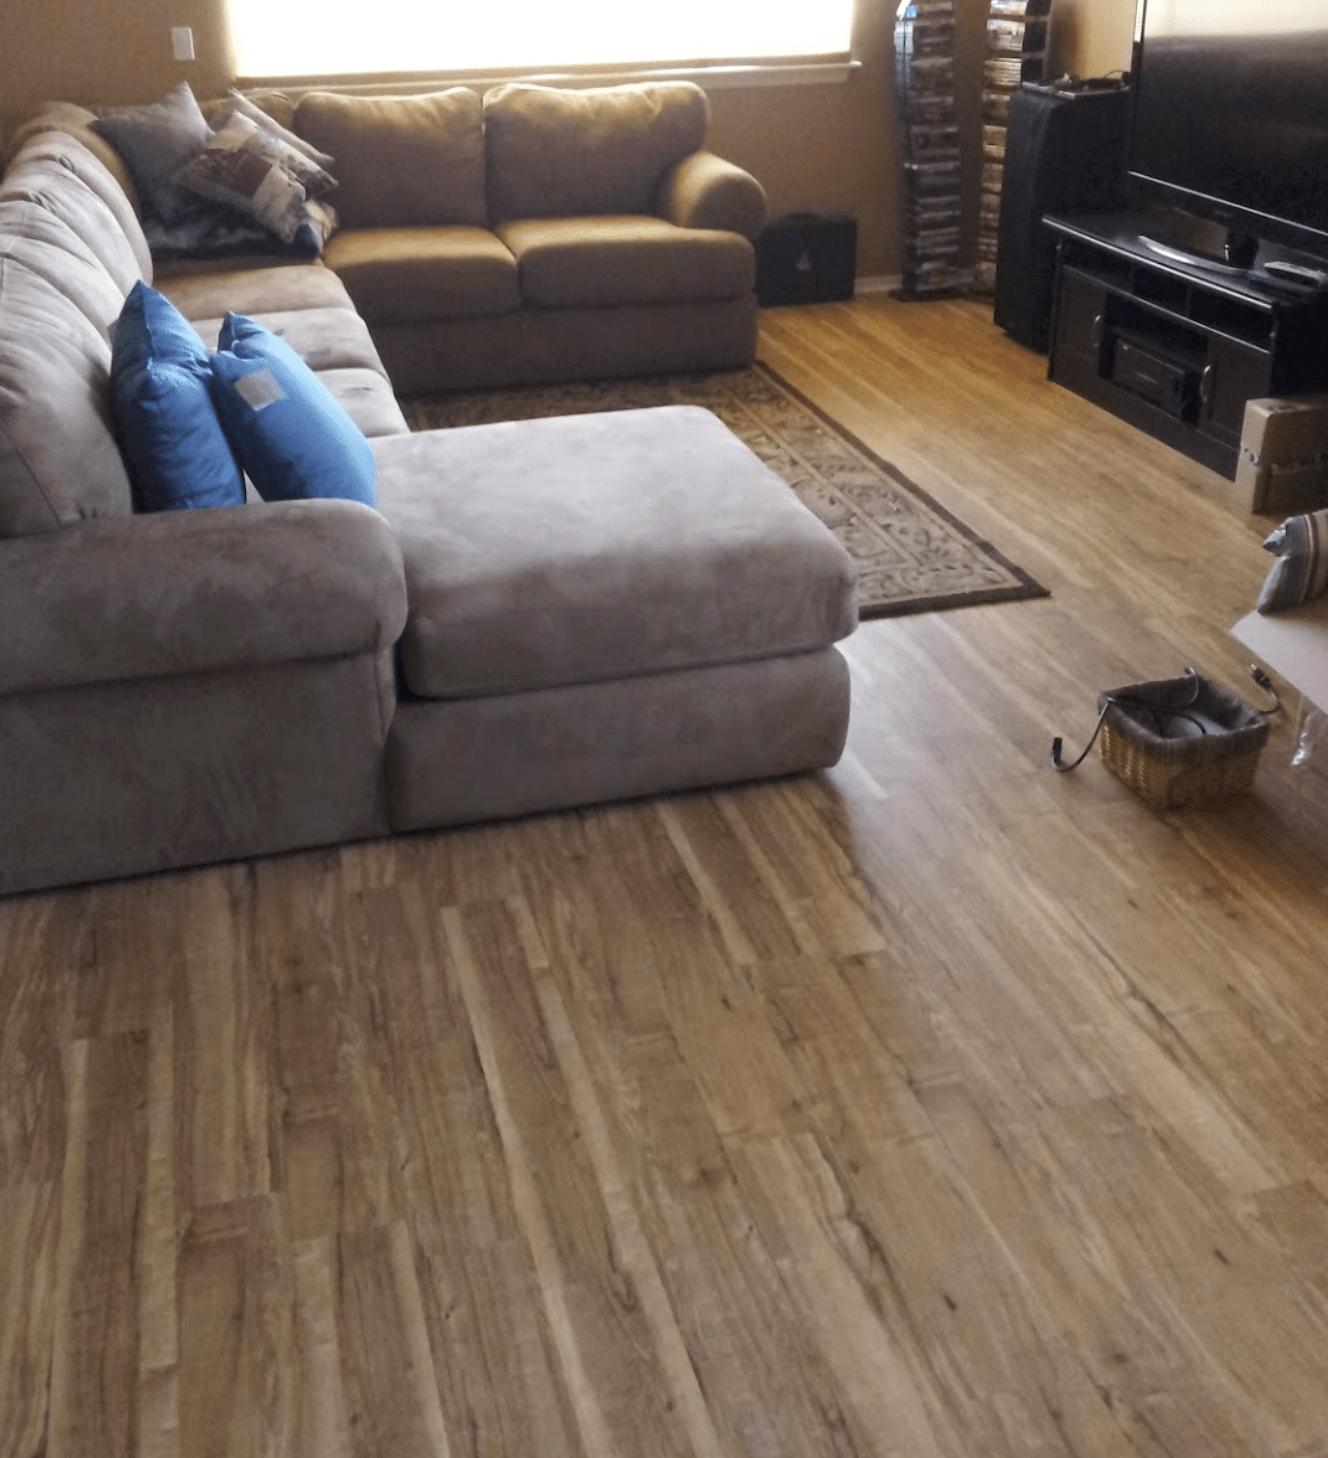 Hardwood flooring from Taylors Flooring in Mesa, AZ